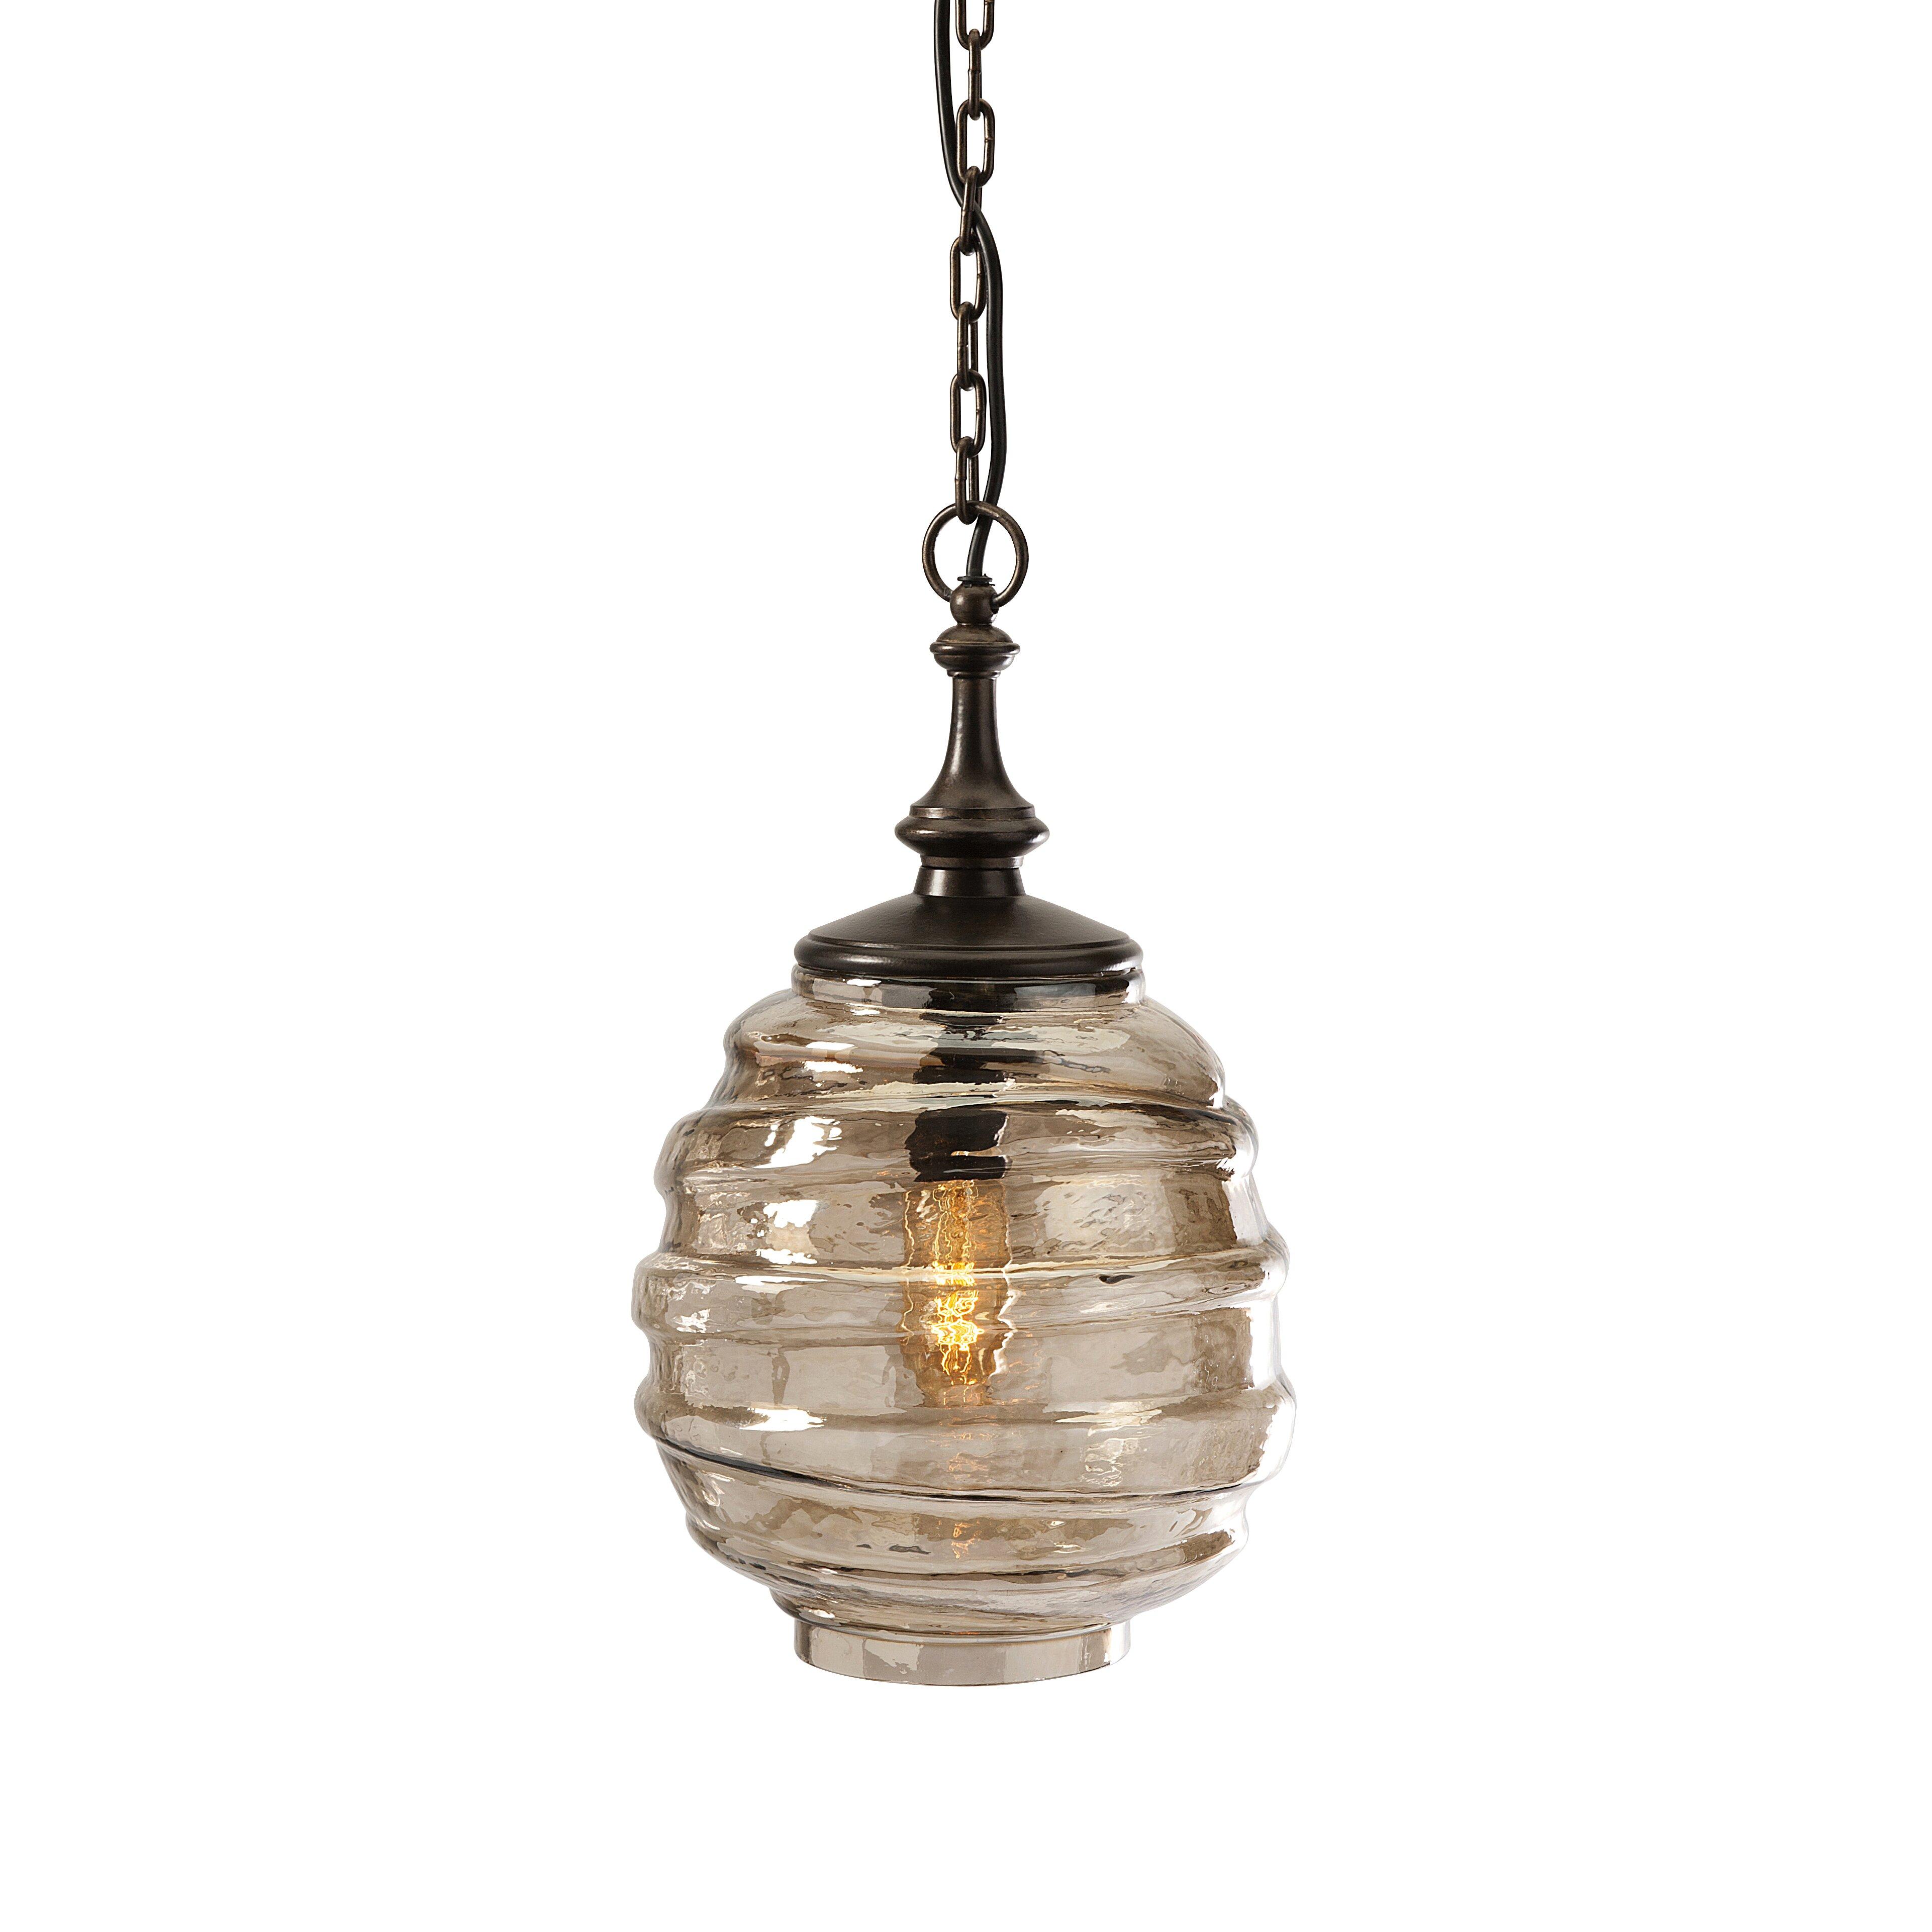 Imax percy glass 1 light pendant reviews wayfair for Wayfair industrial lamp